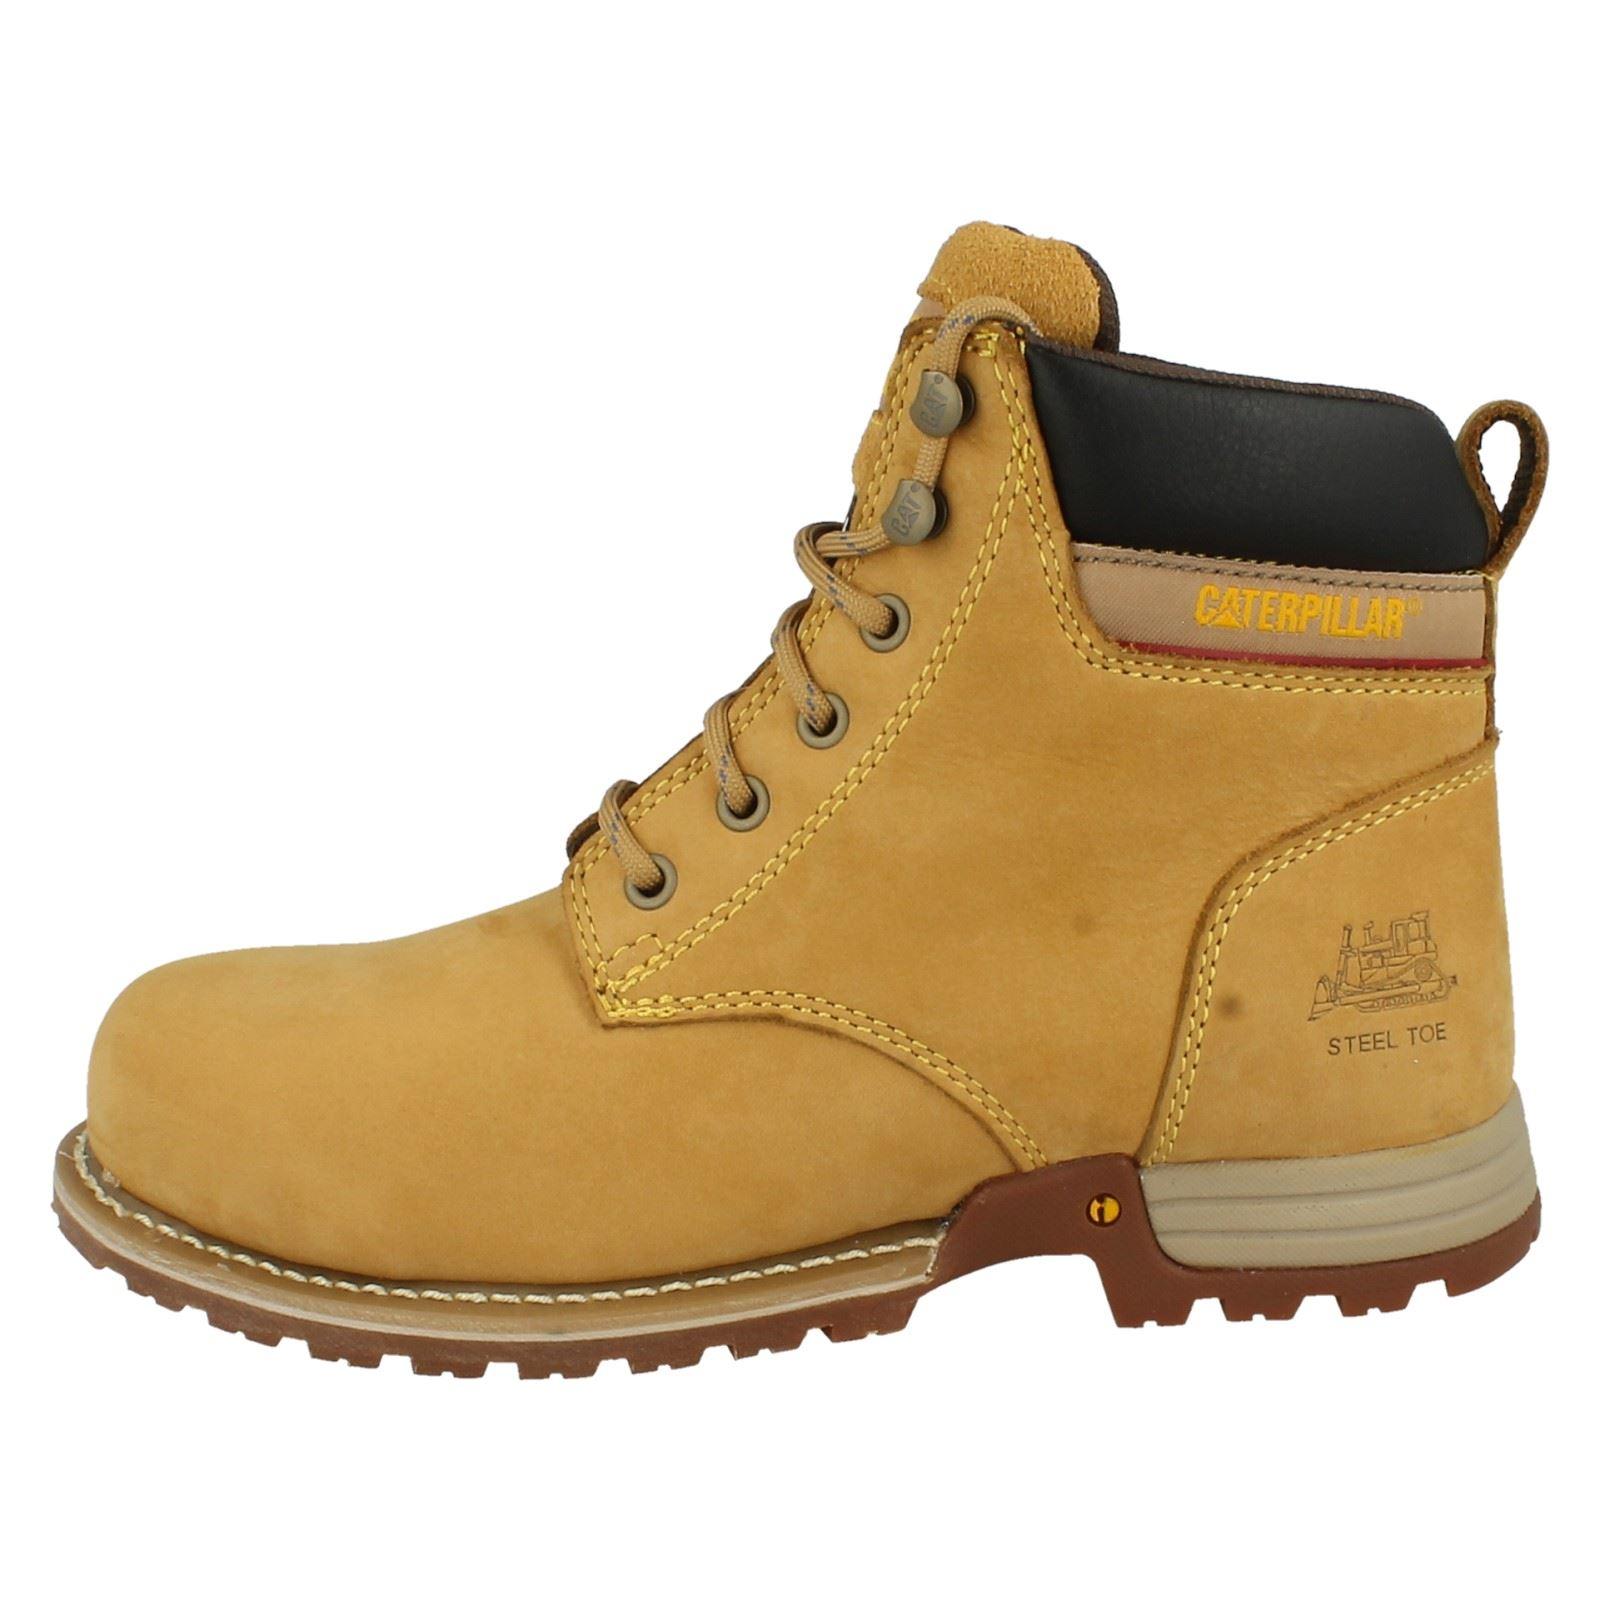 Popular Womens Caterpillar Anna Kick Brown Leather Fur Trim Ankle Biker Boots Size 3-8 | EBay